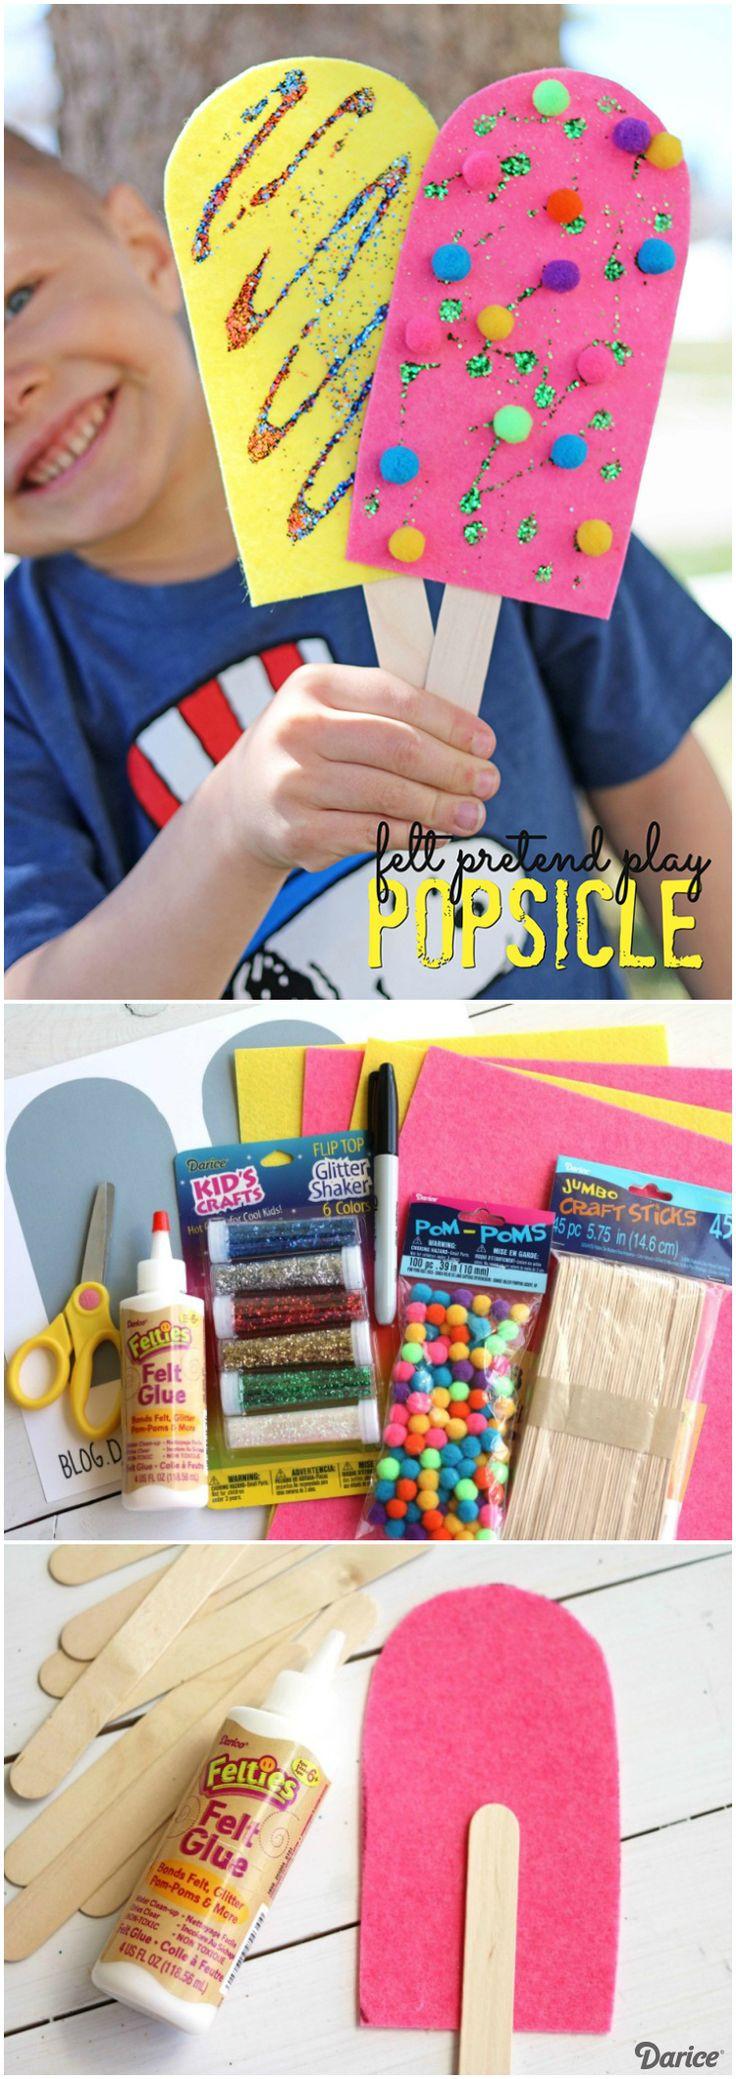 Best ideas about Summer Craft Ideas For Preschoolers . Save or Pin 25 best ideas about Kindergarten crafts summer on Now.